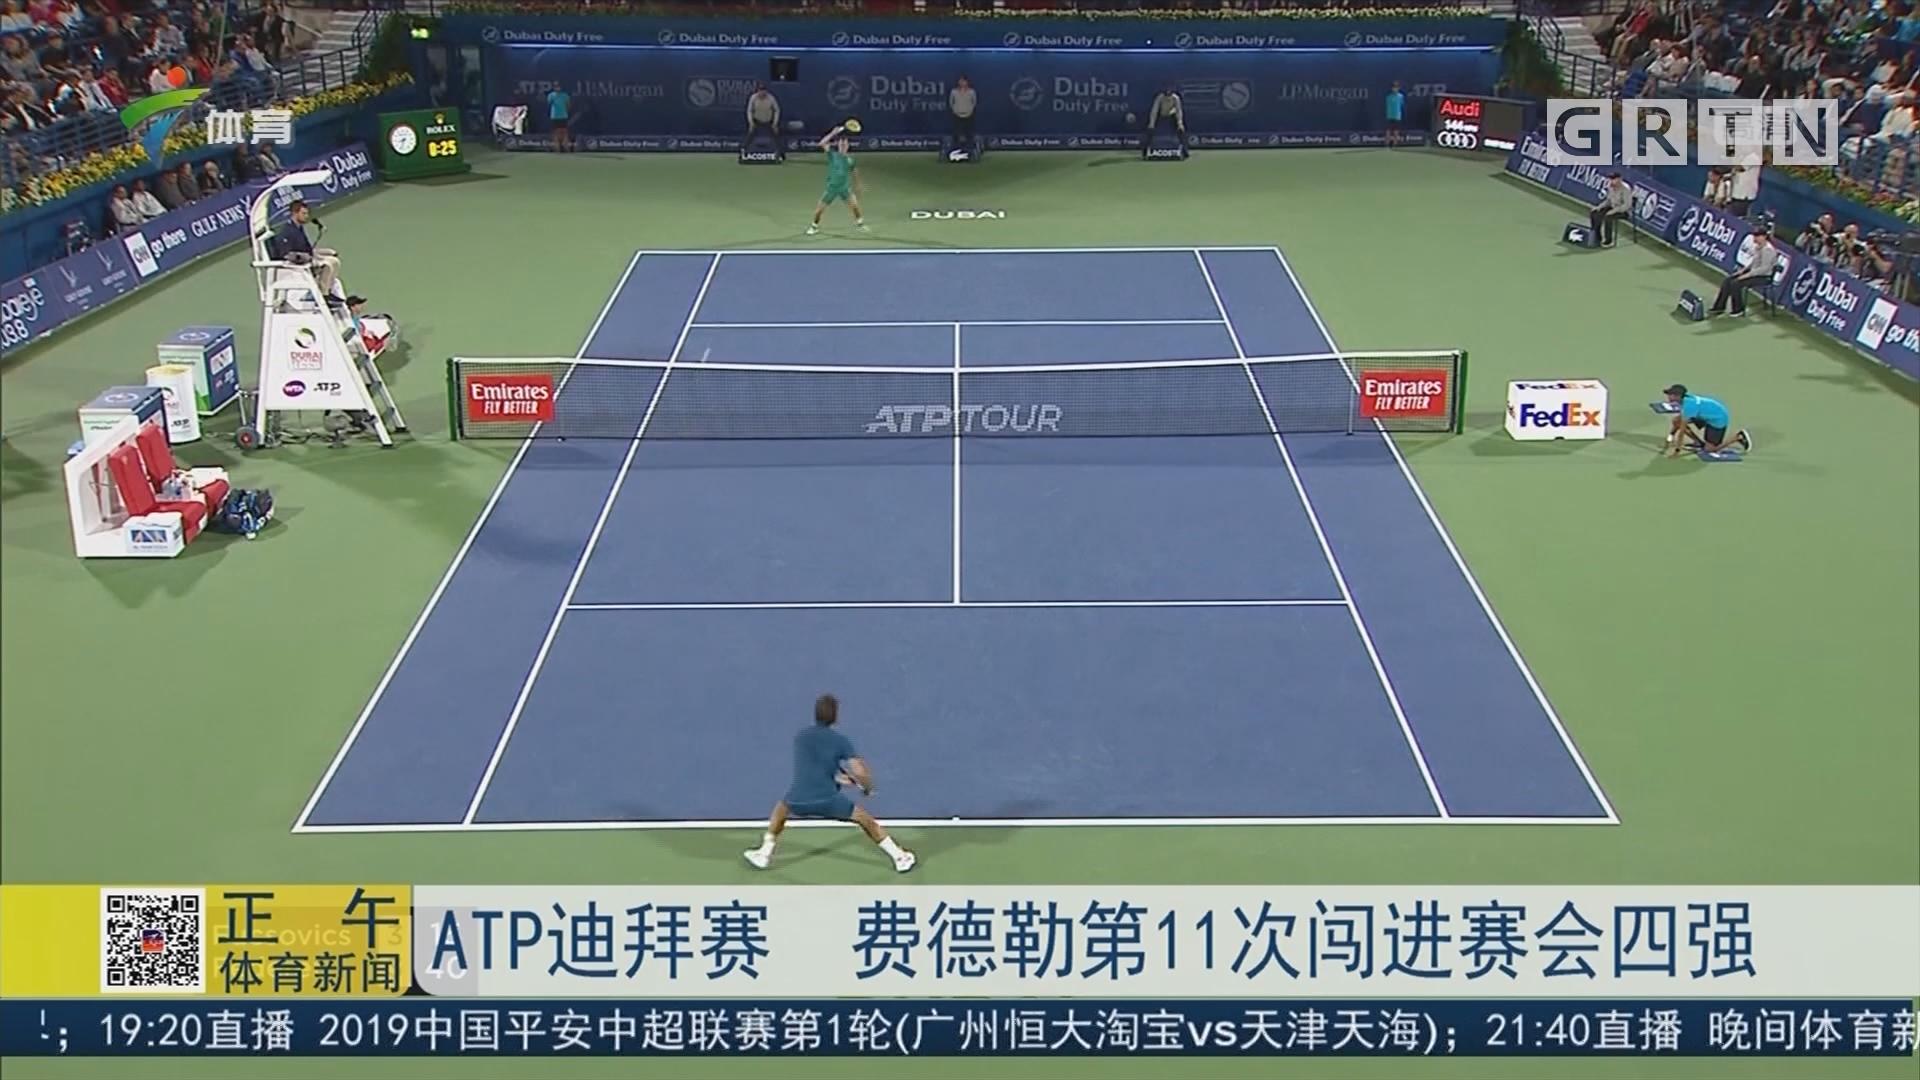 ATP迪拜赛 费德勒第11次闯进赛会四强